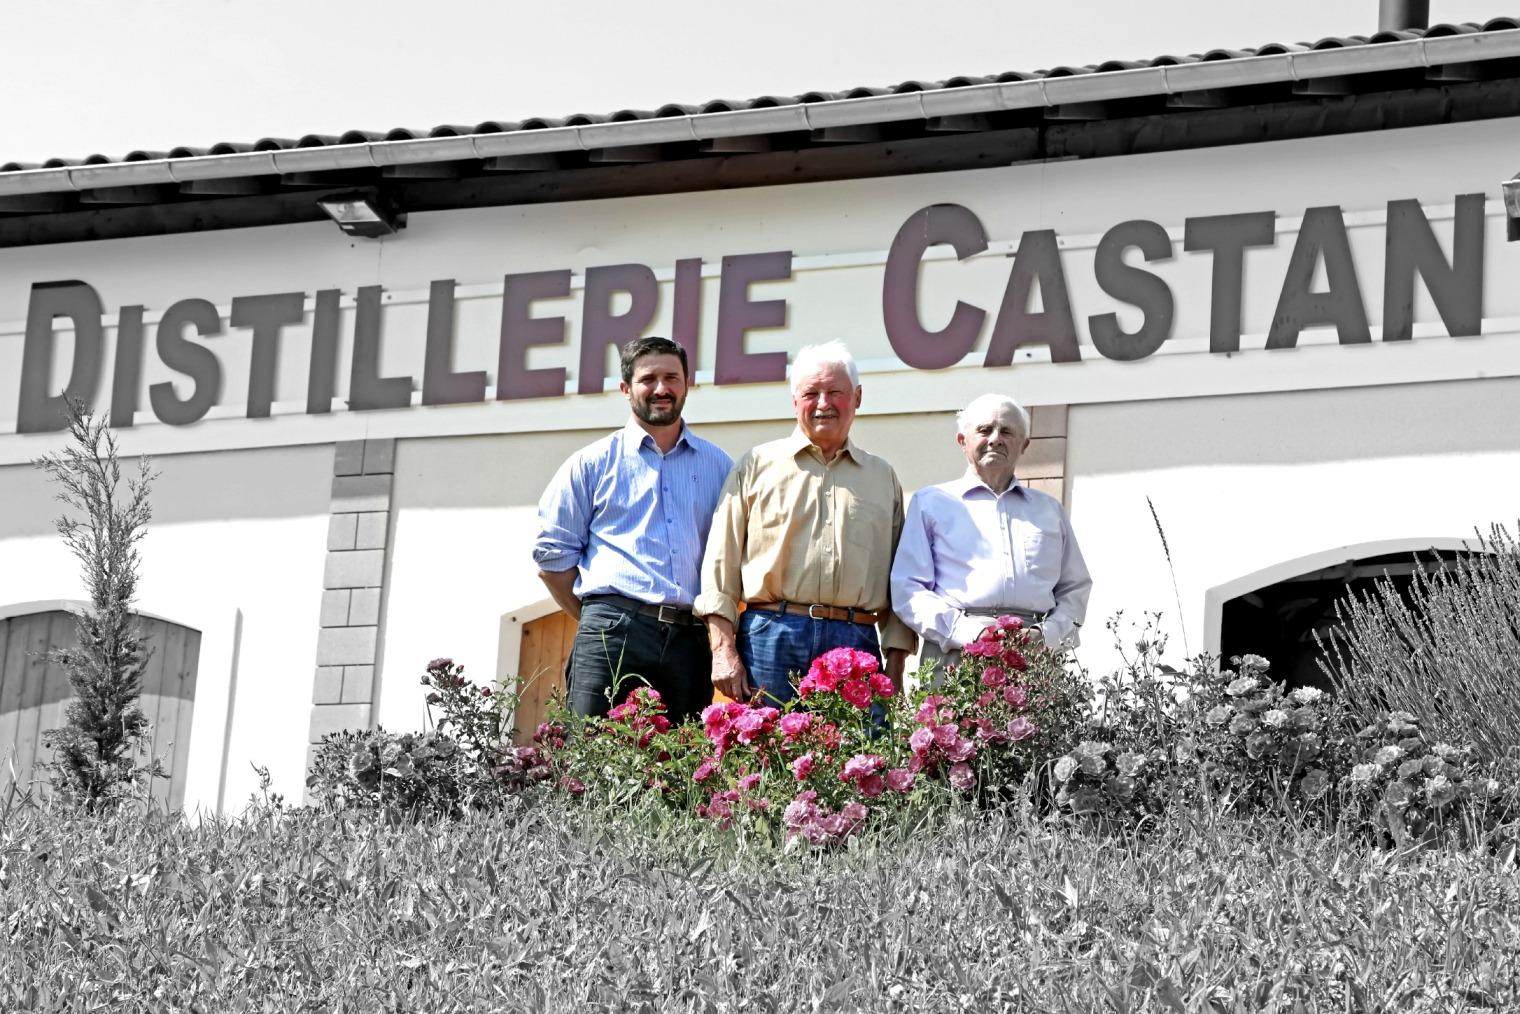 Distillerie Castan – Whisky made in Tarn